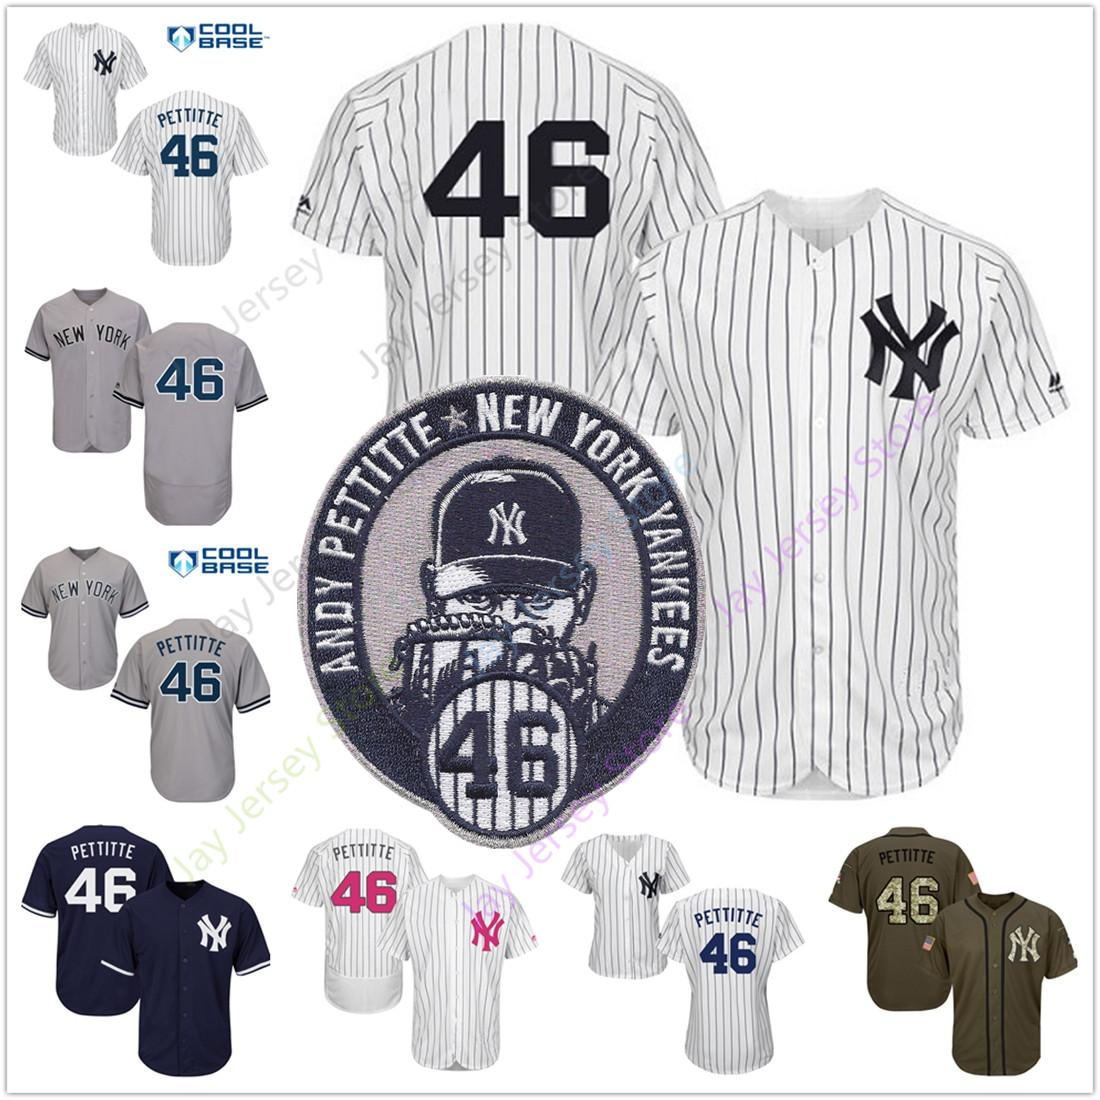 premium selection e5e45 59a8d Custom Andy Pettitte Yankees Jersey New York Home Away White Pinstripe Grey  Men Women Youth Size S-3XL